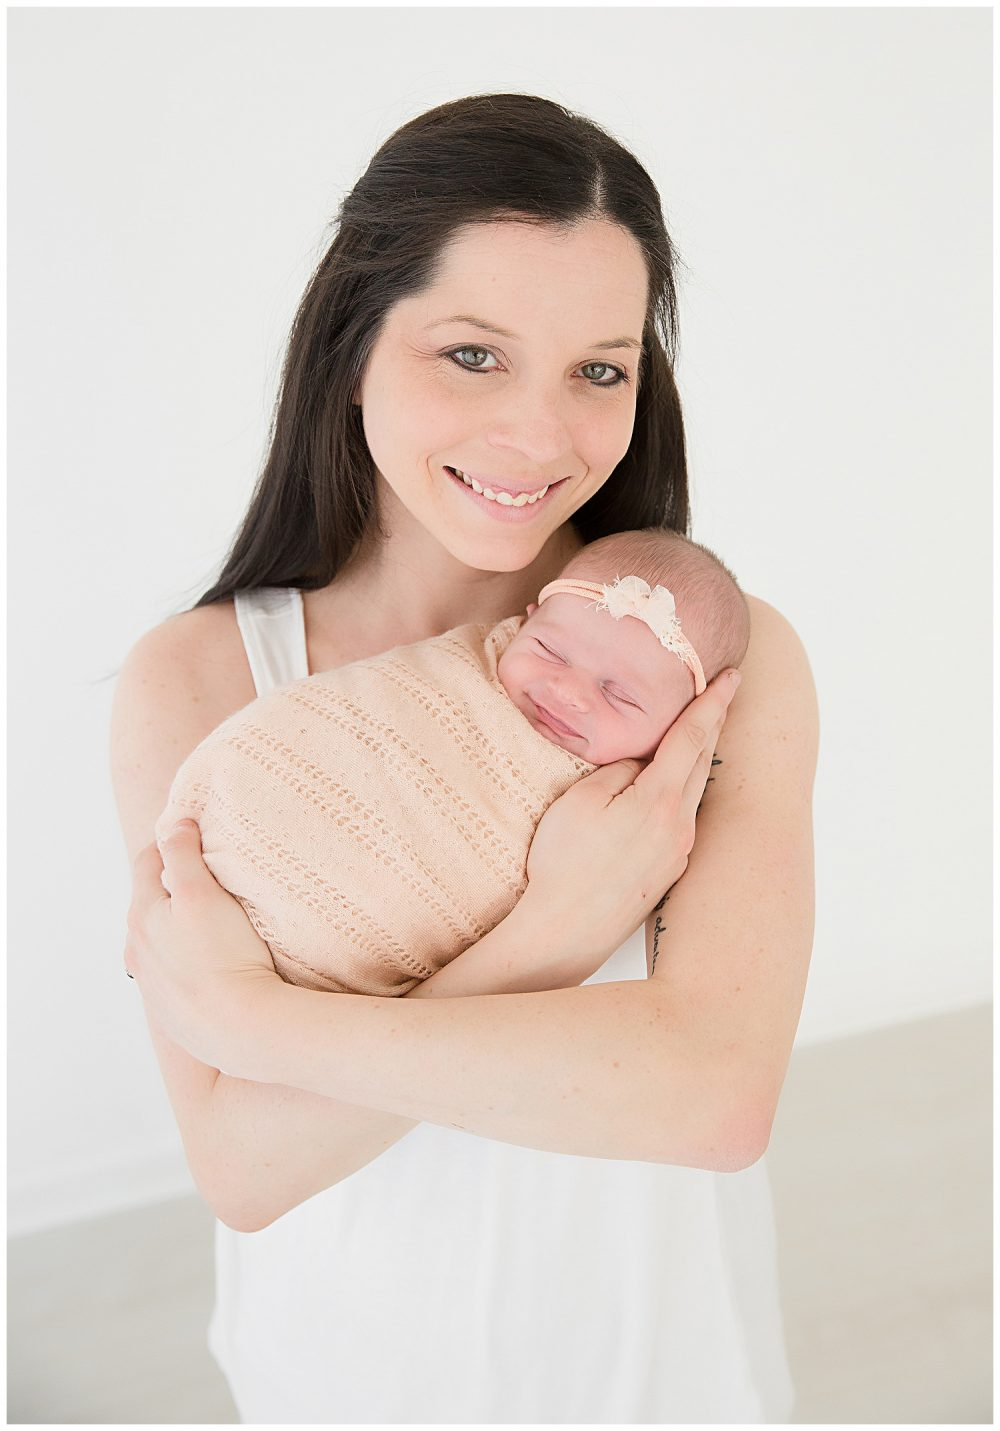 mom+holding+her+baby+girl+smiling